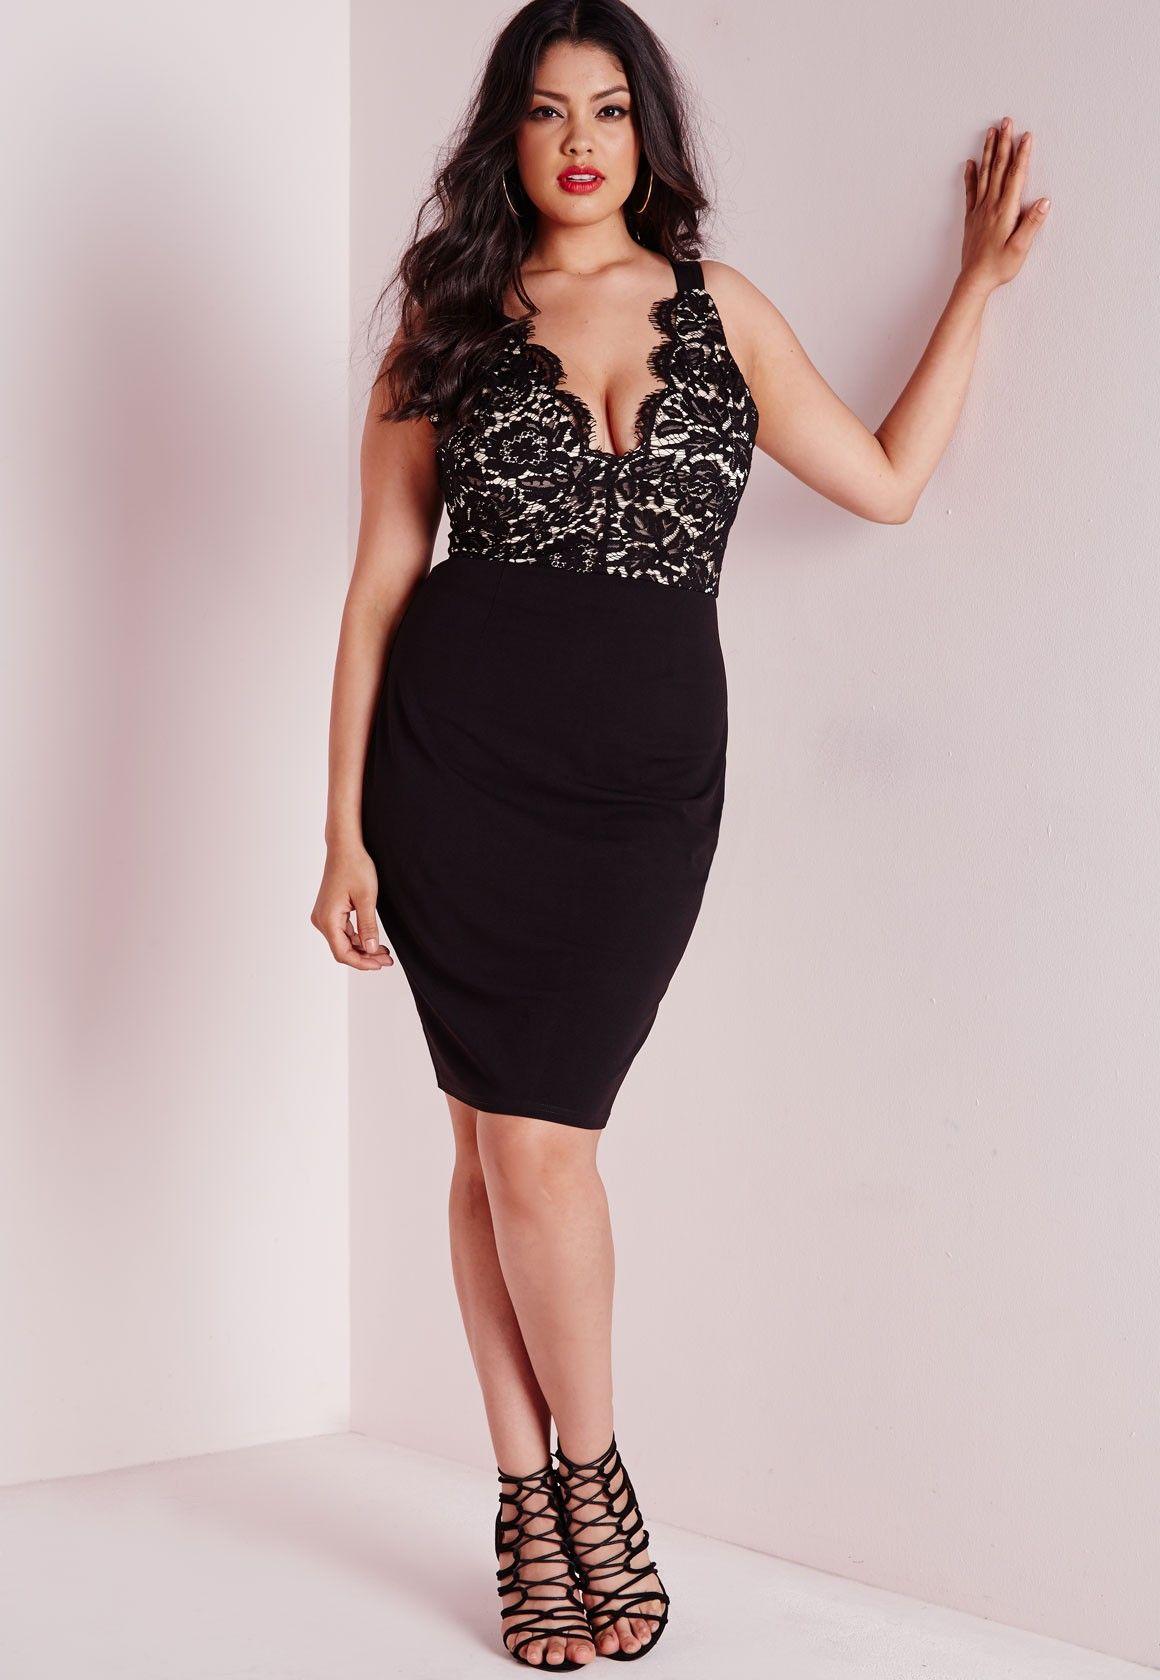 Missguided Plus Size Lace Plunge Midi Dress Black Plus Size Outfits Fashion Formal Dresses Curvy [ 1680 x 1160 Pixel ]